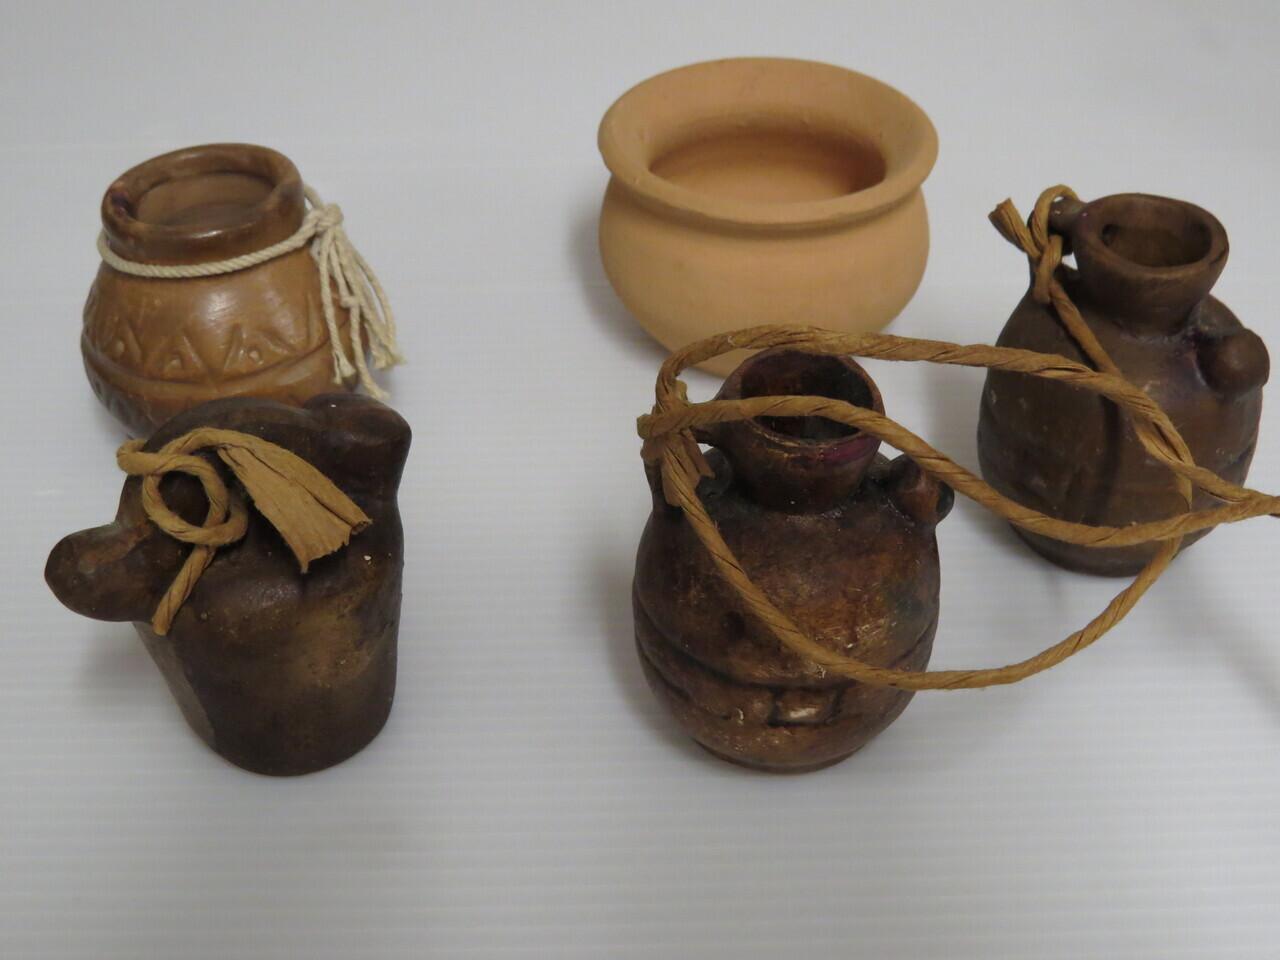 Lote: 19 - Lote: 19 - Lote de cerámica